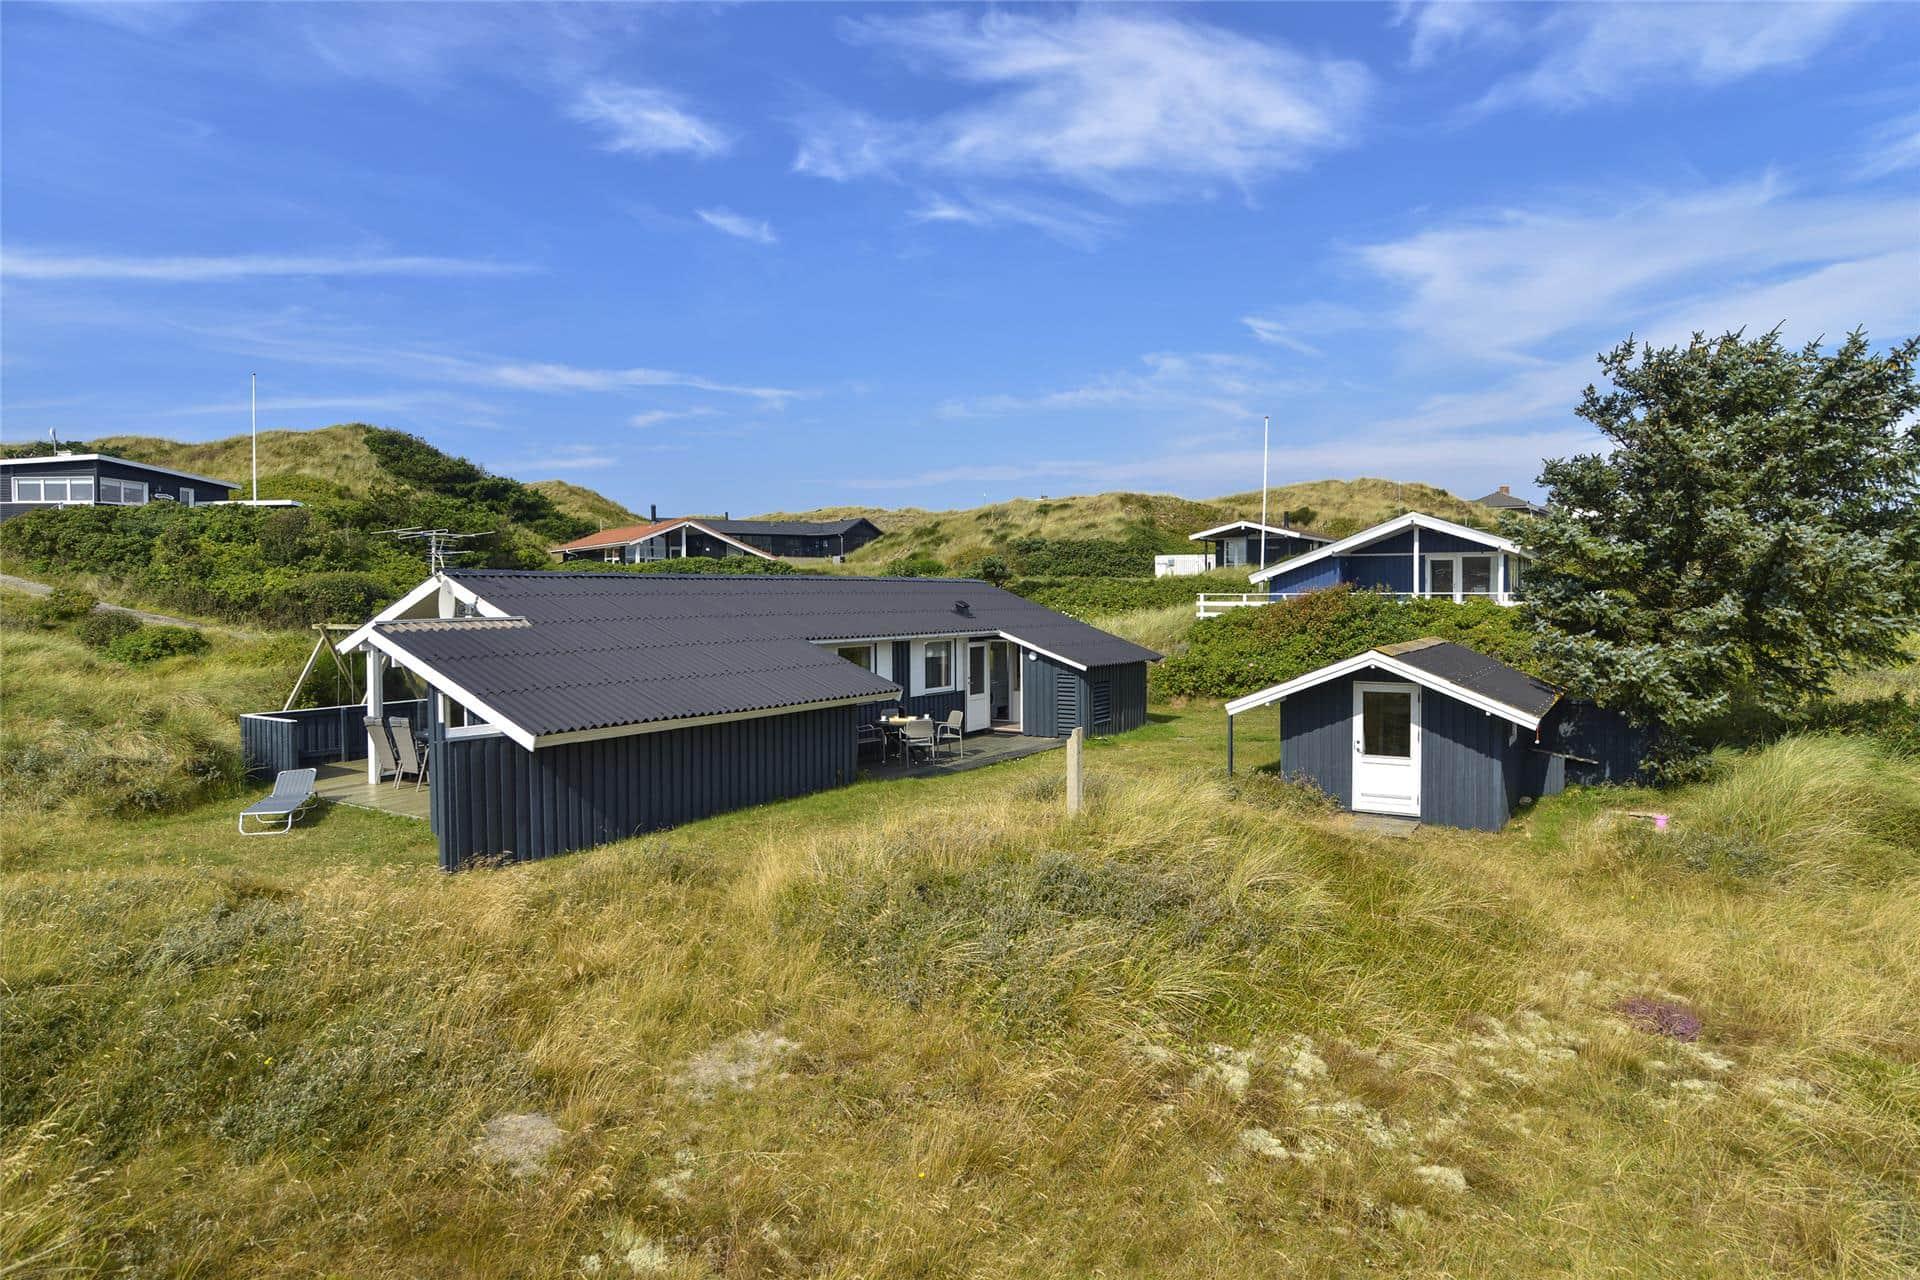 Bild 1-4 Ferienhaus 767, Søndergade 76, DK - 6960 Hvide Sande